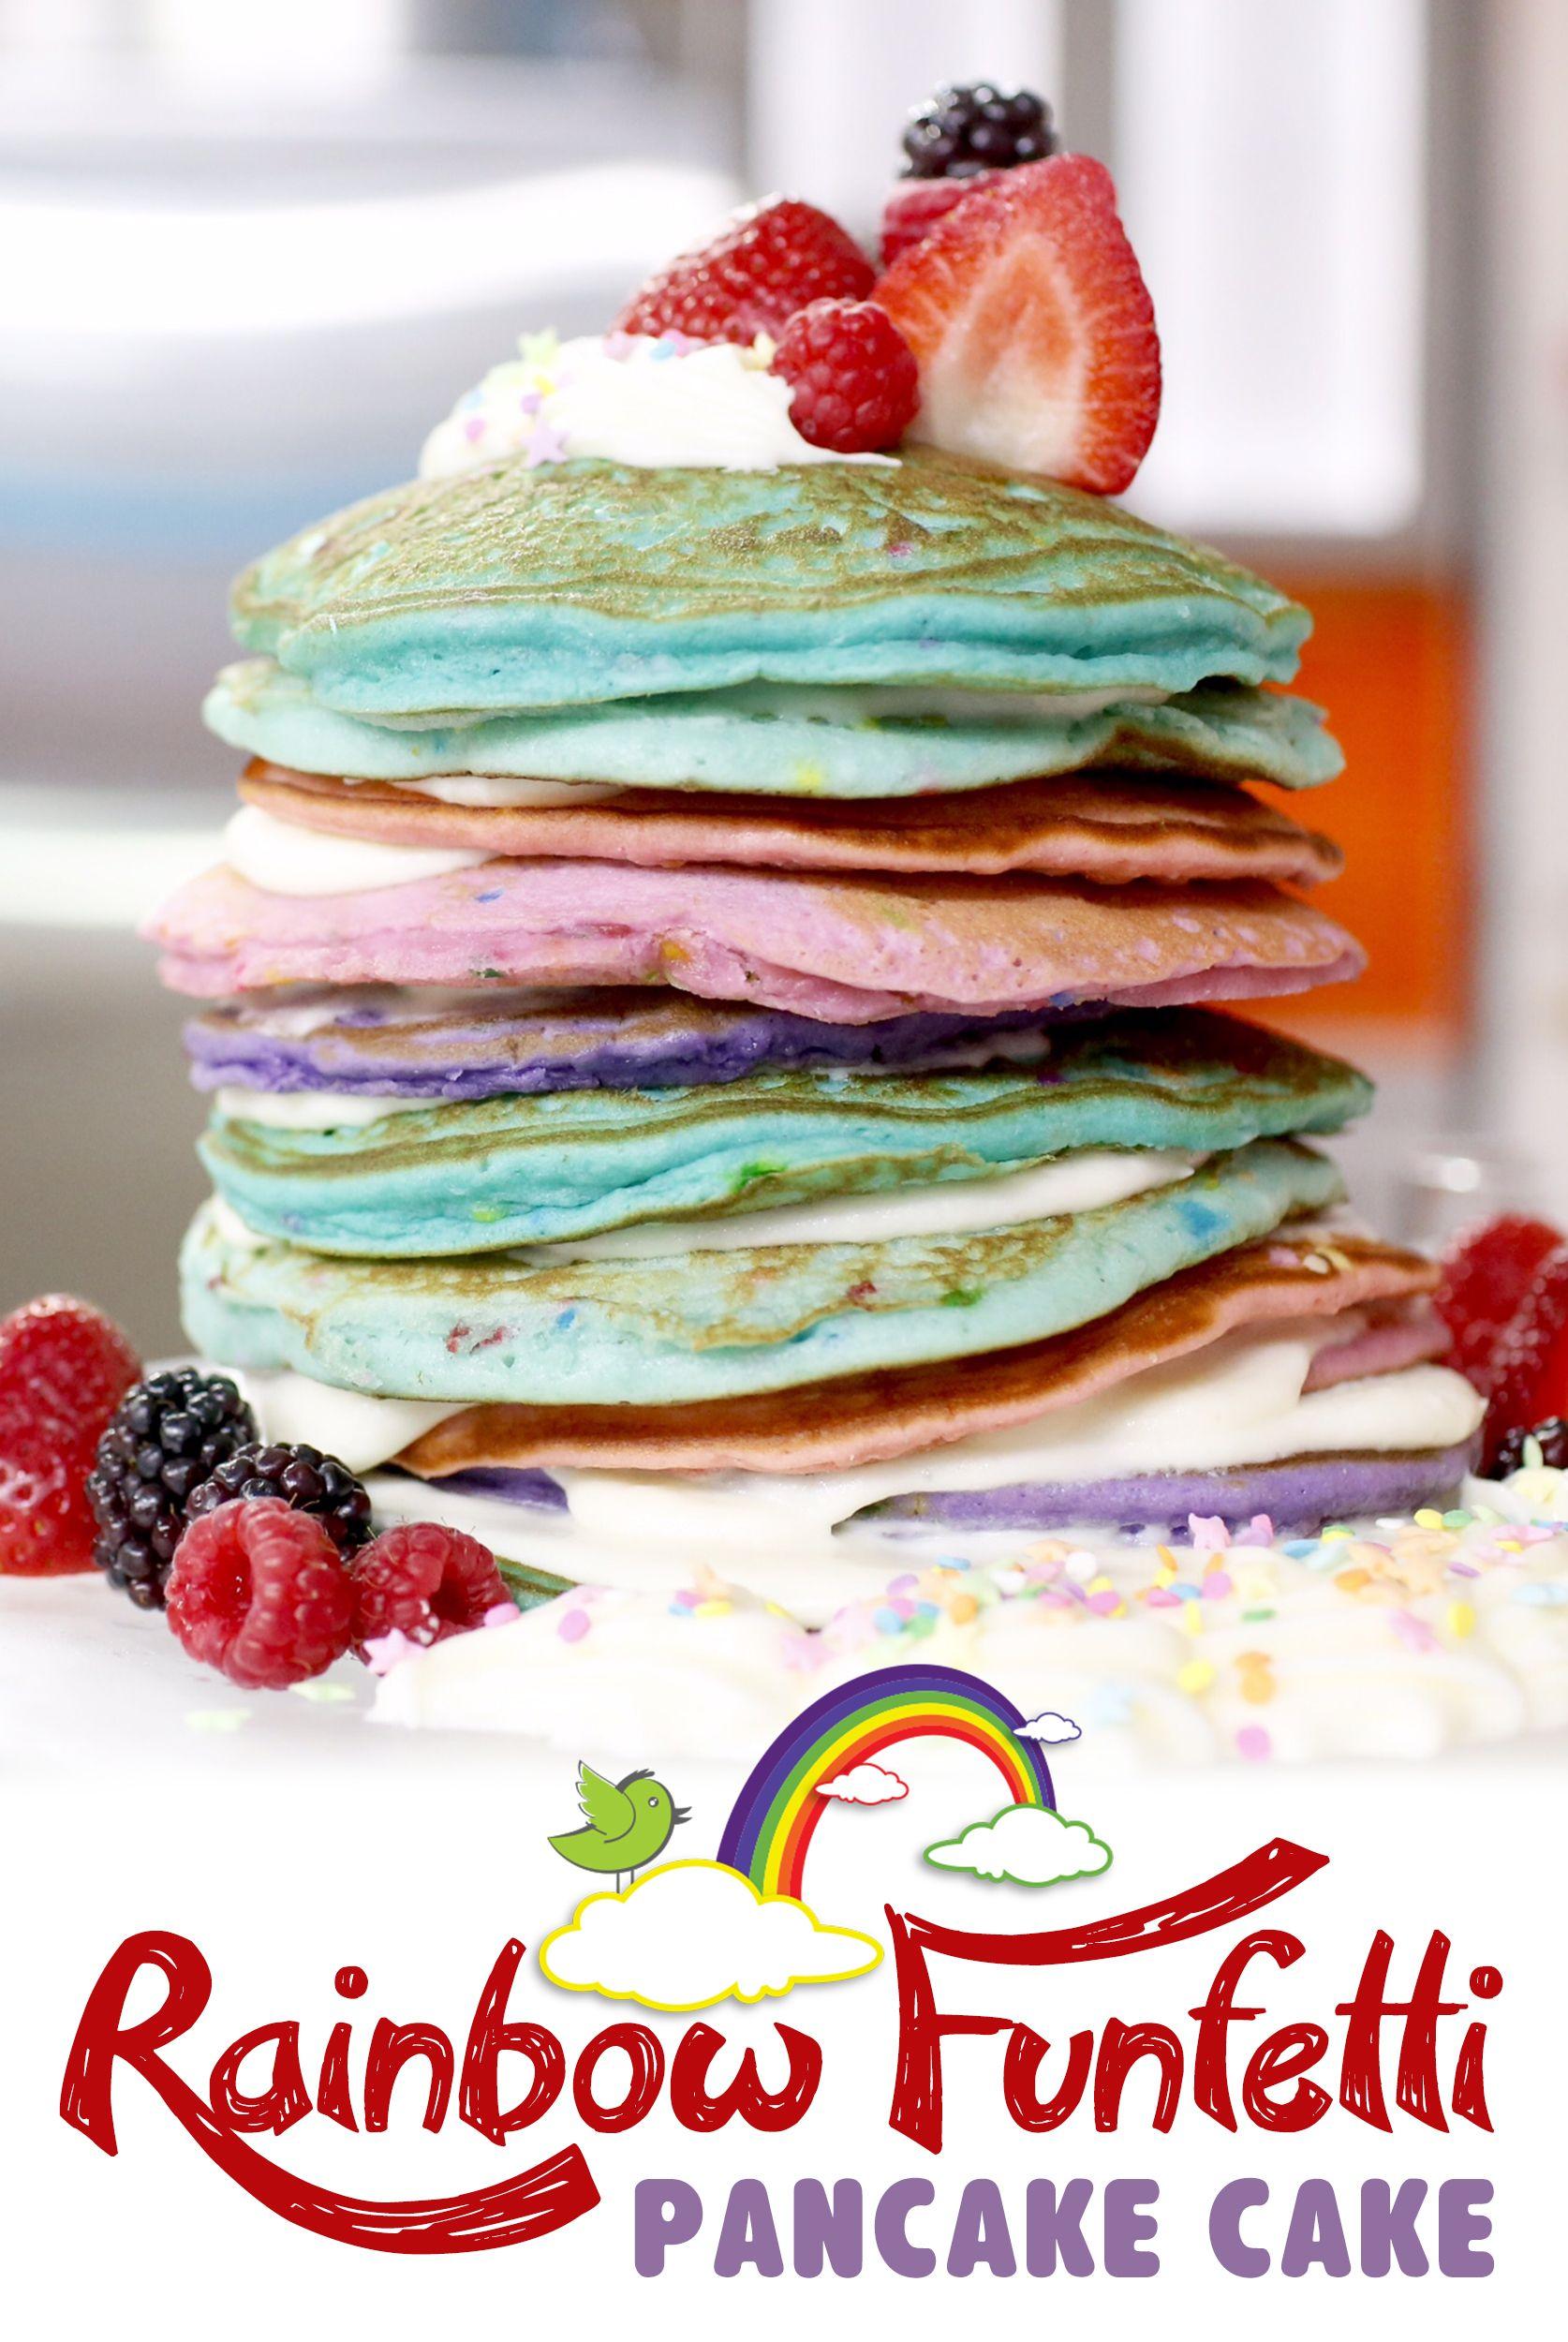 Rainbow Funfetti Pancake Cake Recipe Pancakes Pancake